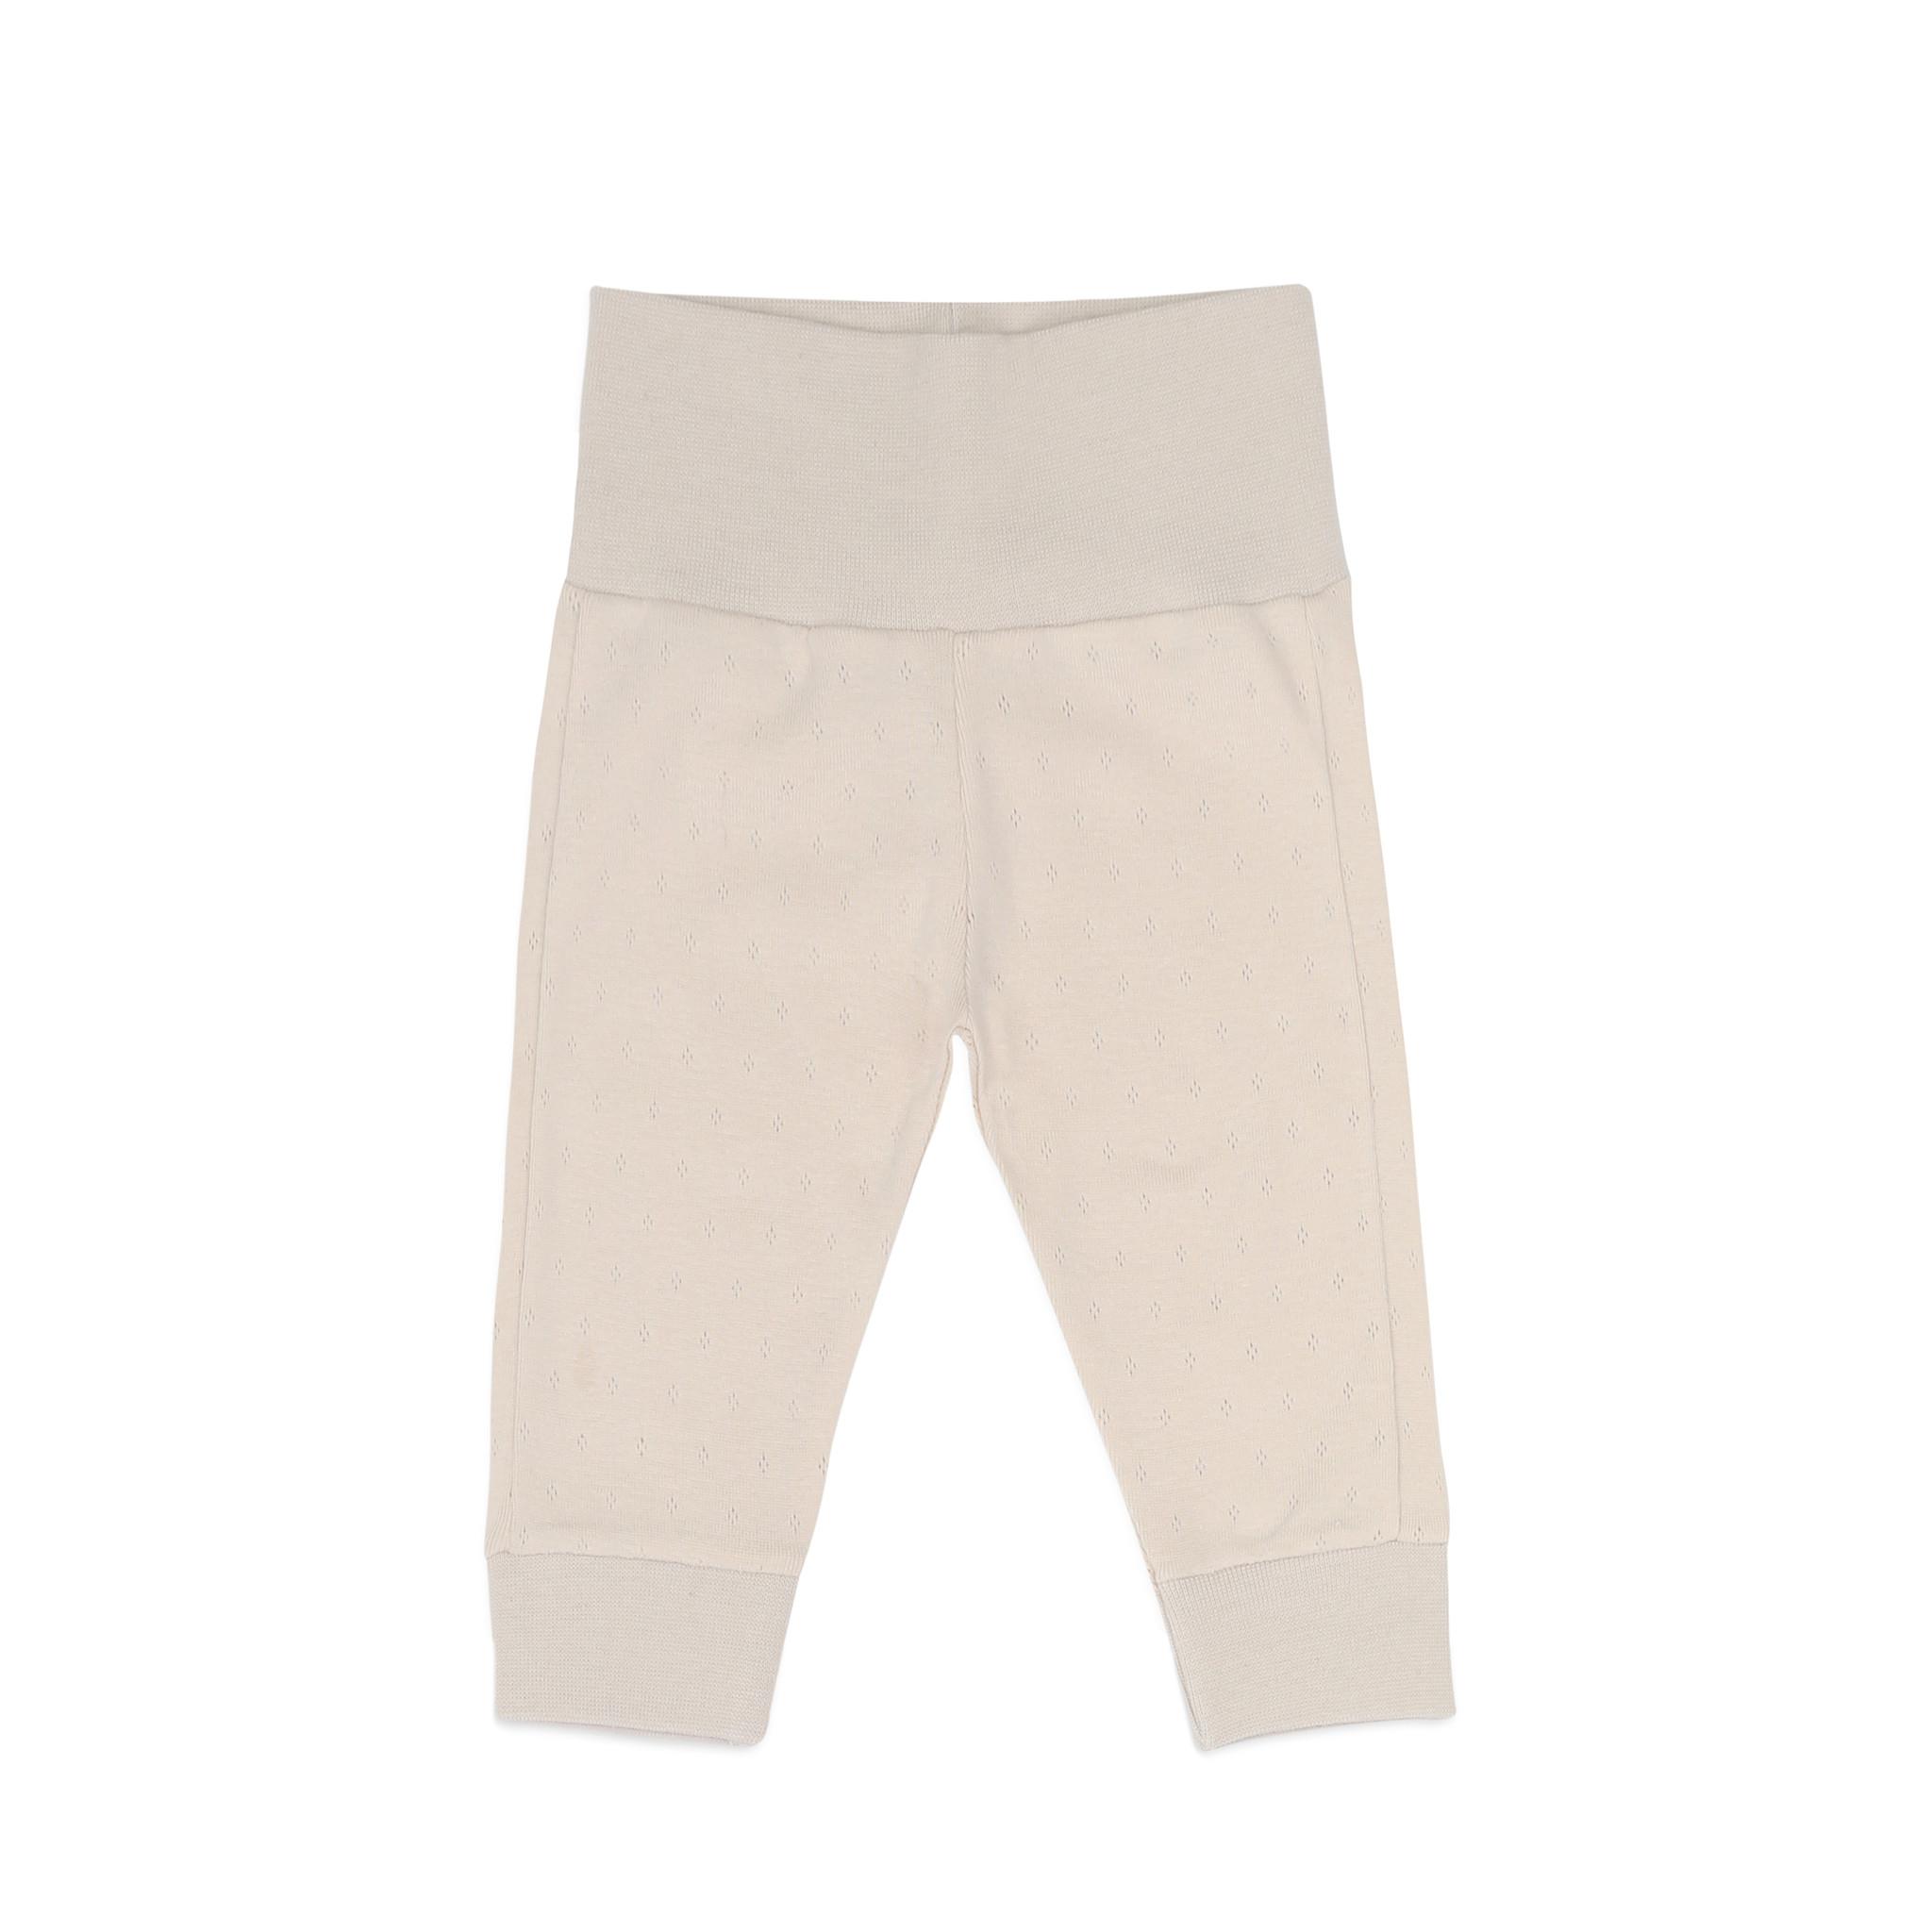 Newborn leggings pointelle - Oatmeal-1